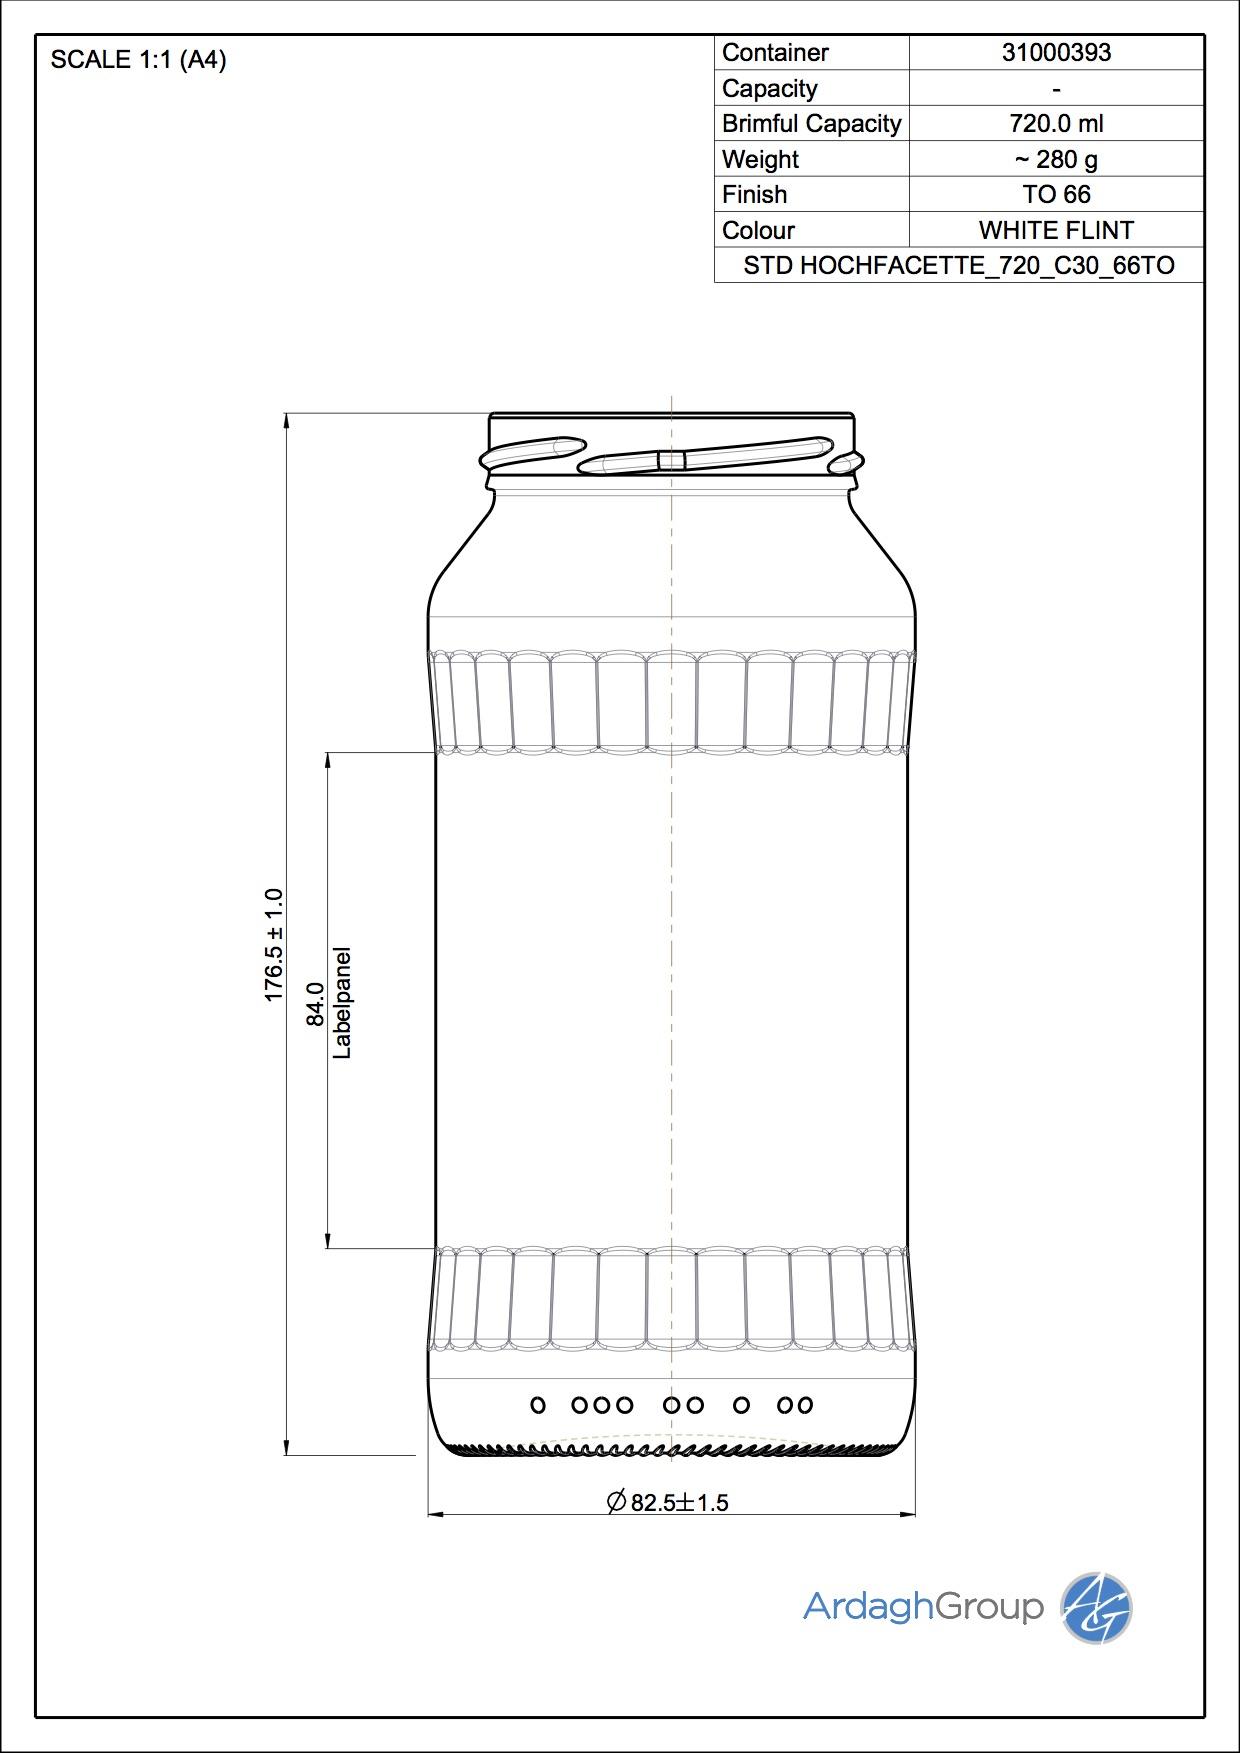 Hochfacette 720 C30 66TO